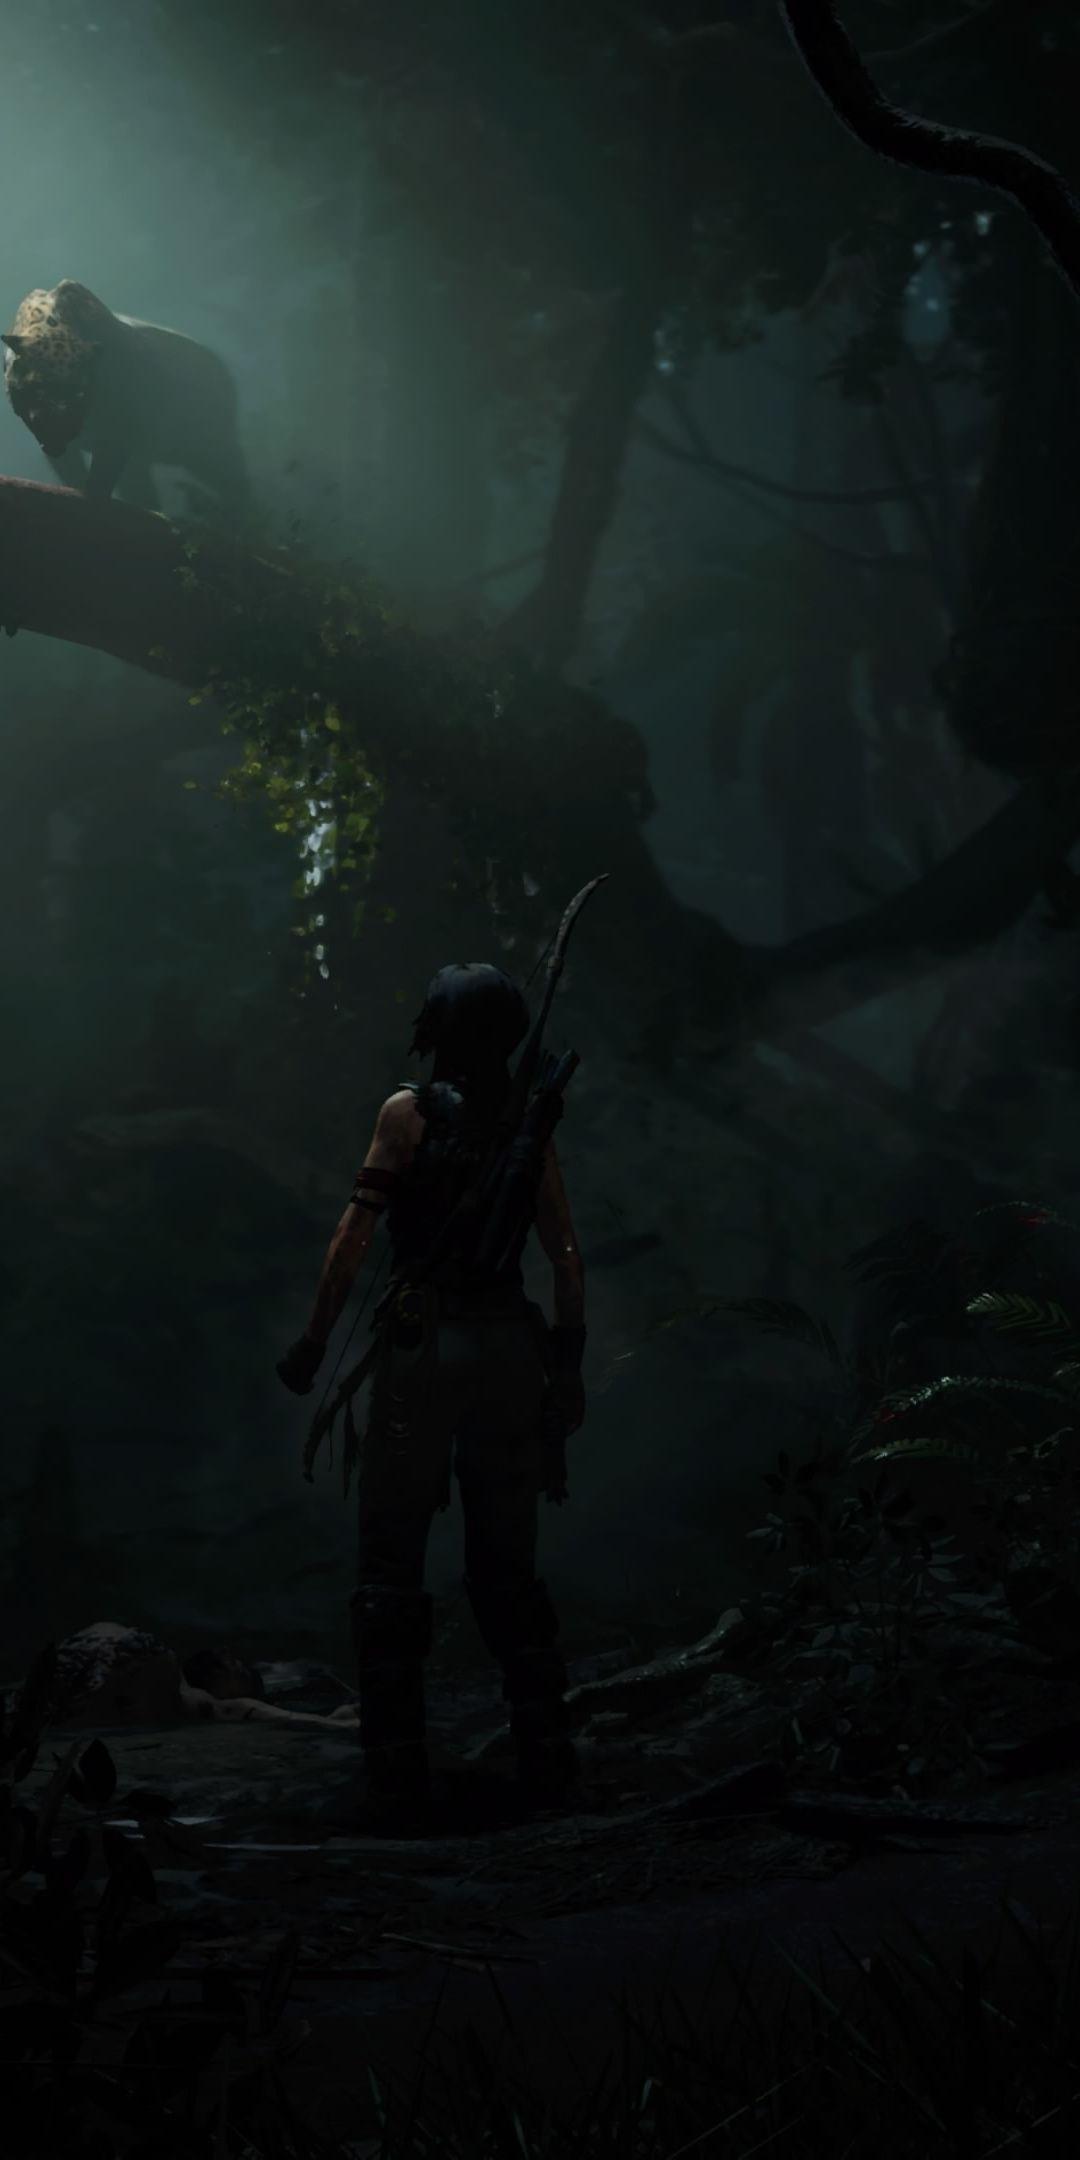 Tomb Raider Outdoor Dark 1080x2160 Wallpaper Tomb Raider Tomb Raider Lara Croft Lara Croft Tomb